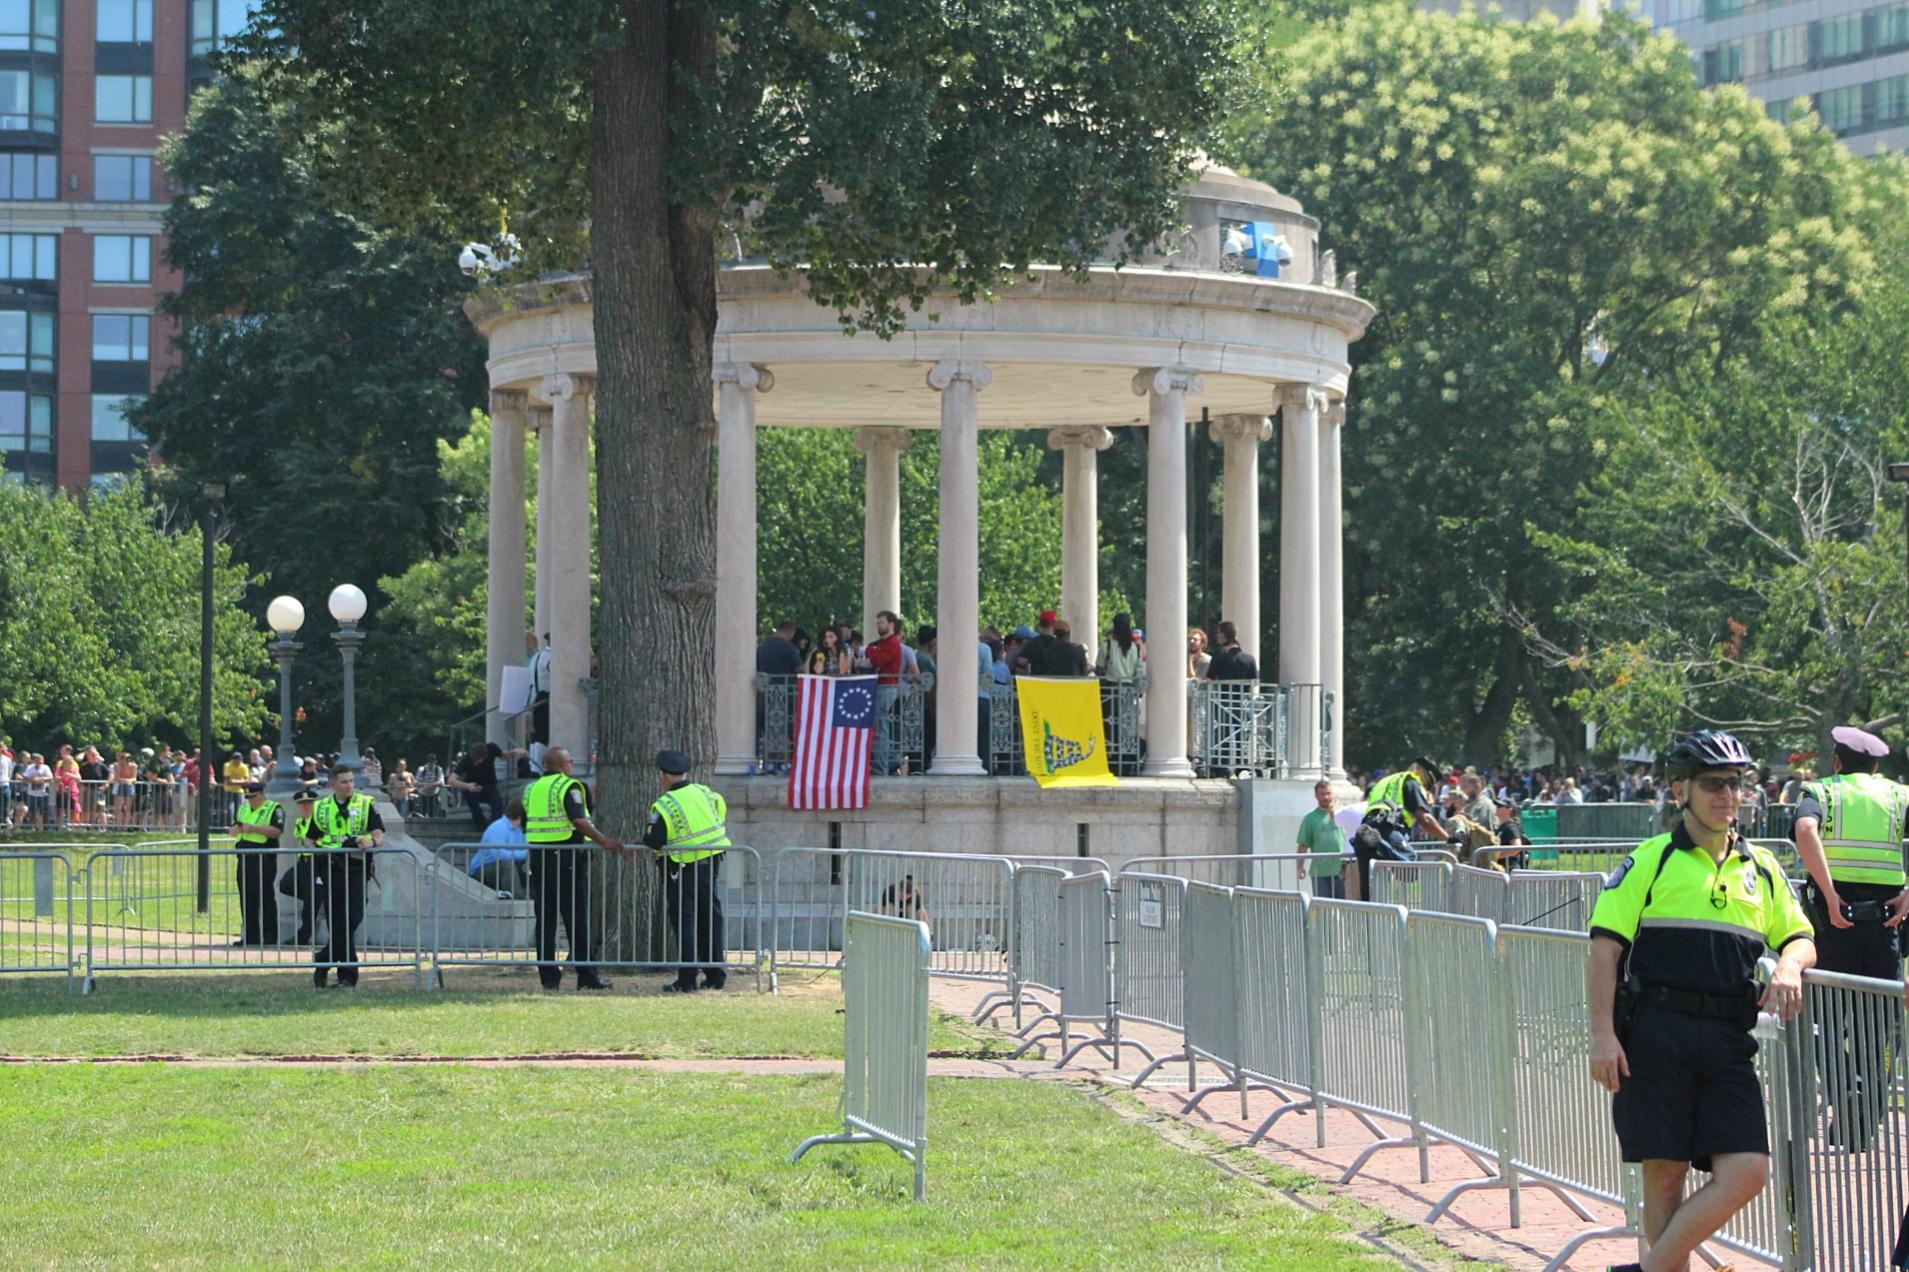 2017-08-19 Boston Free Speech 18